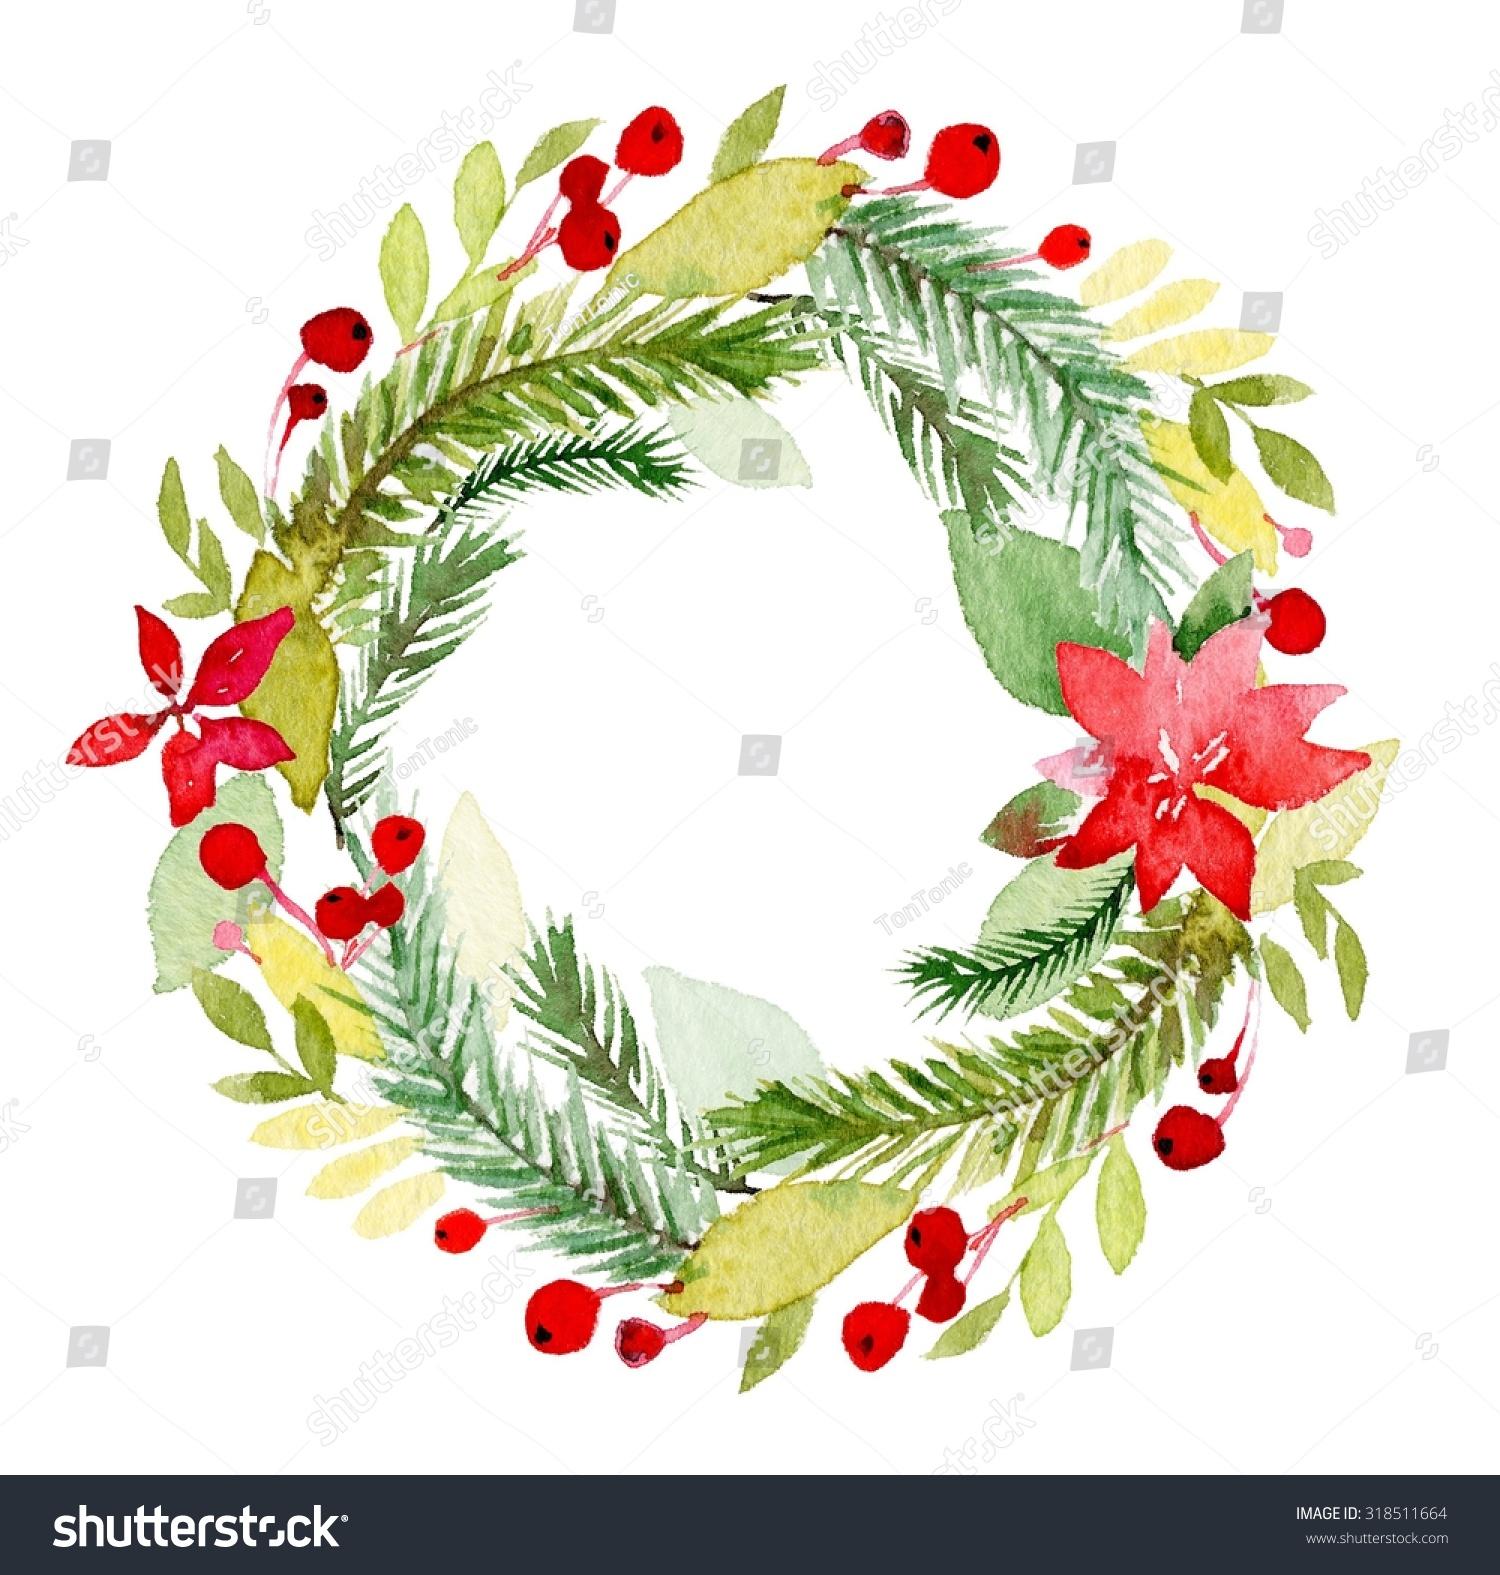 Watercolor christmas wreath poinsettia plant tree stock for Poinsettia christmas tree frame